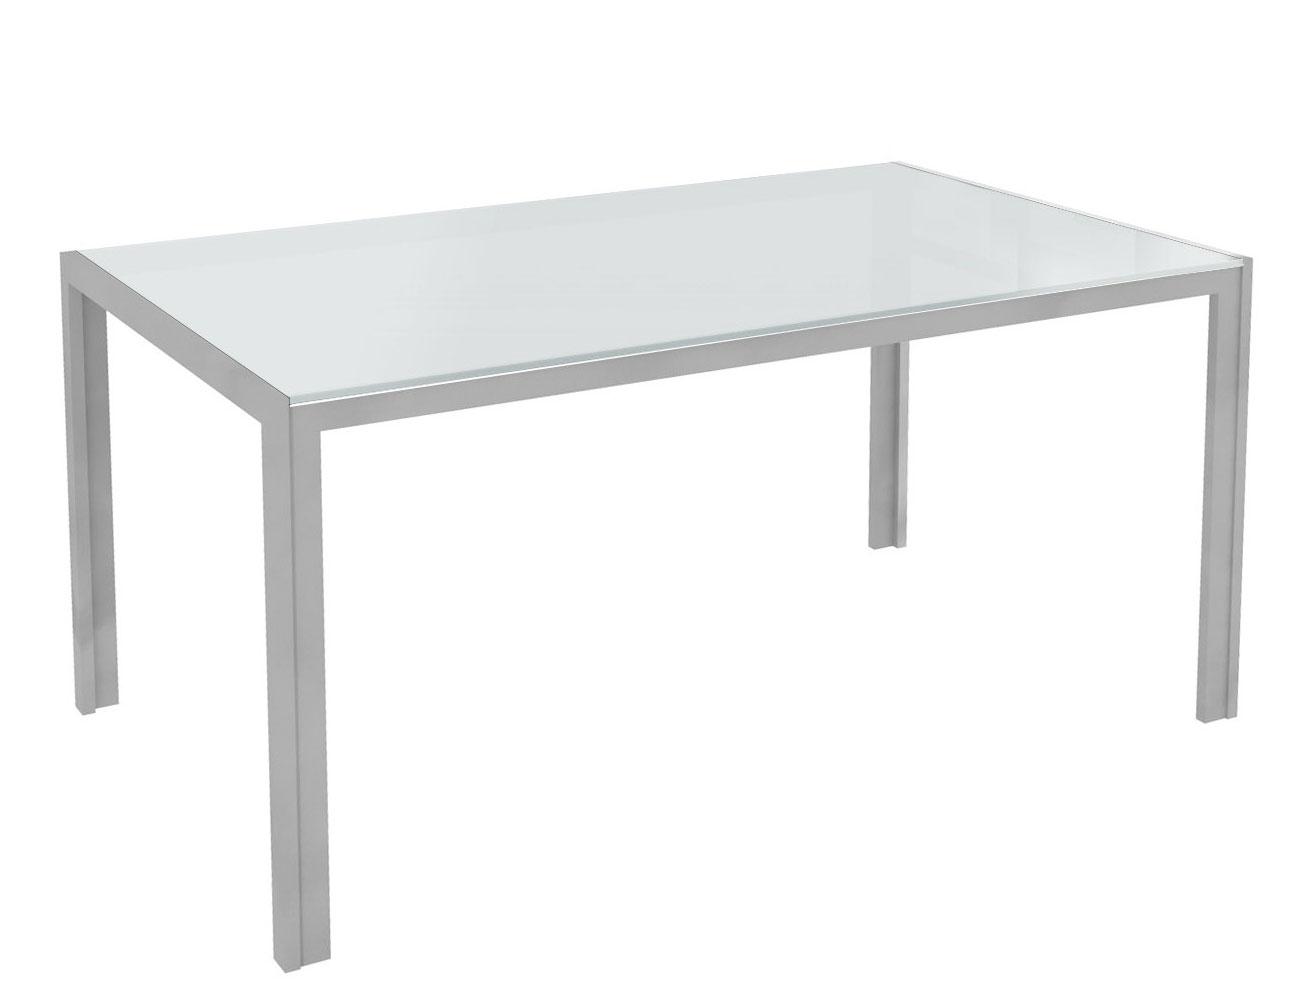 Mesa comedor cristal templado 281 blanca